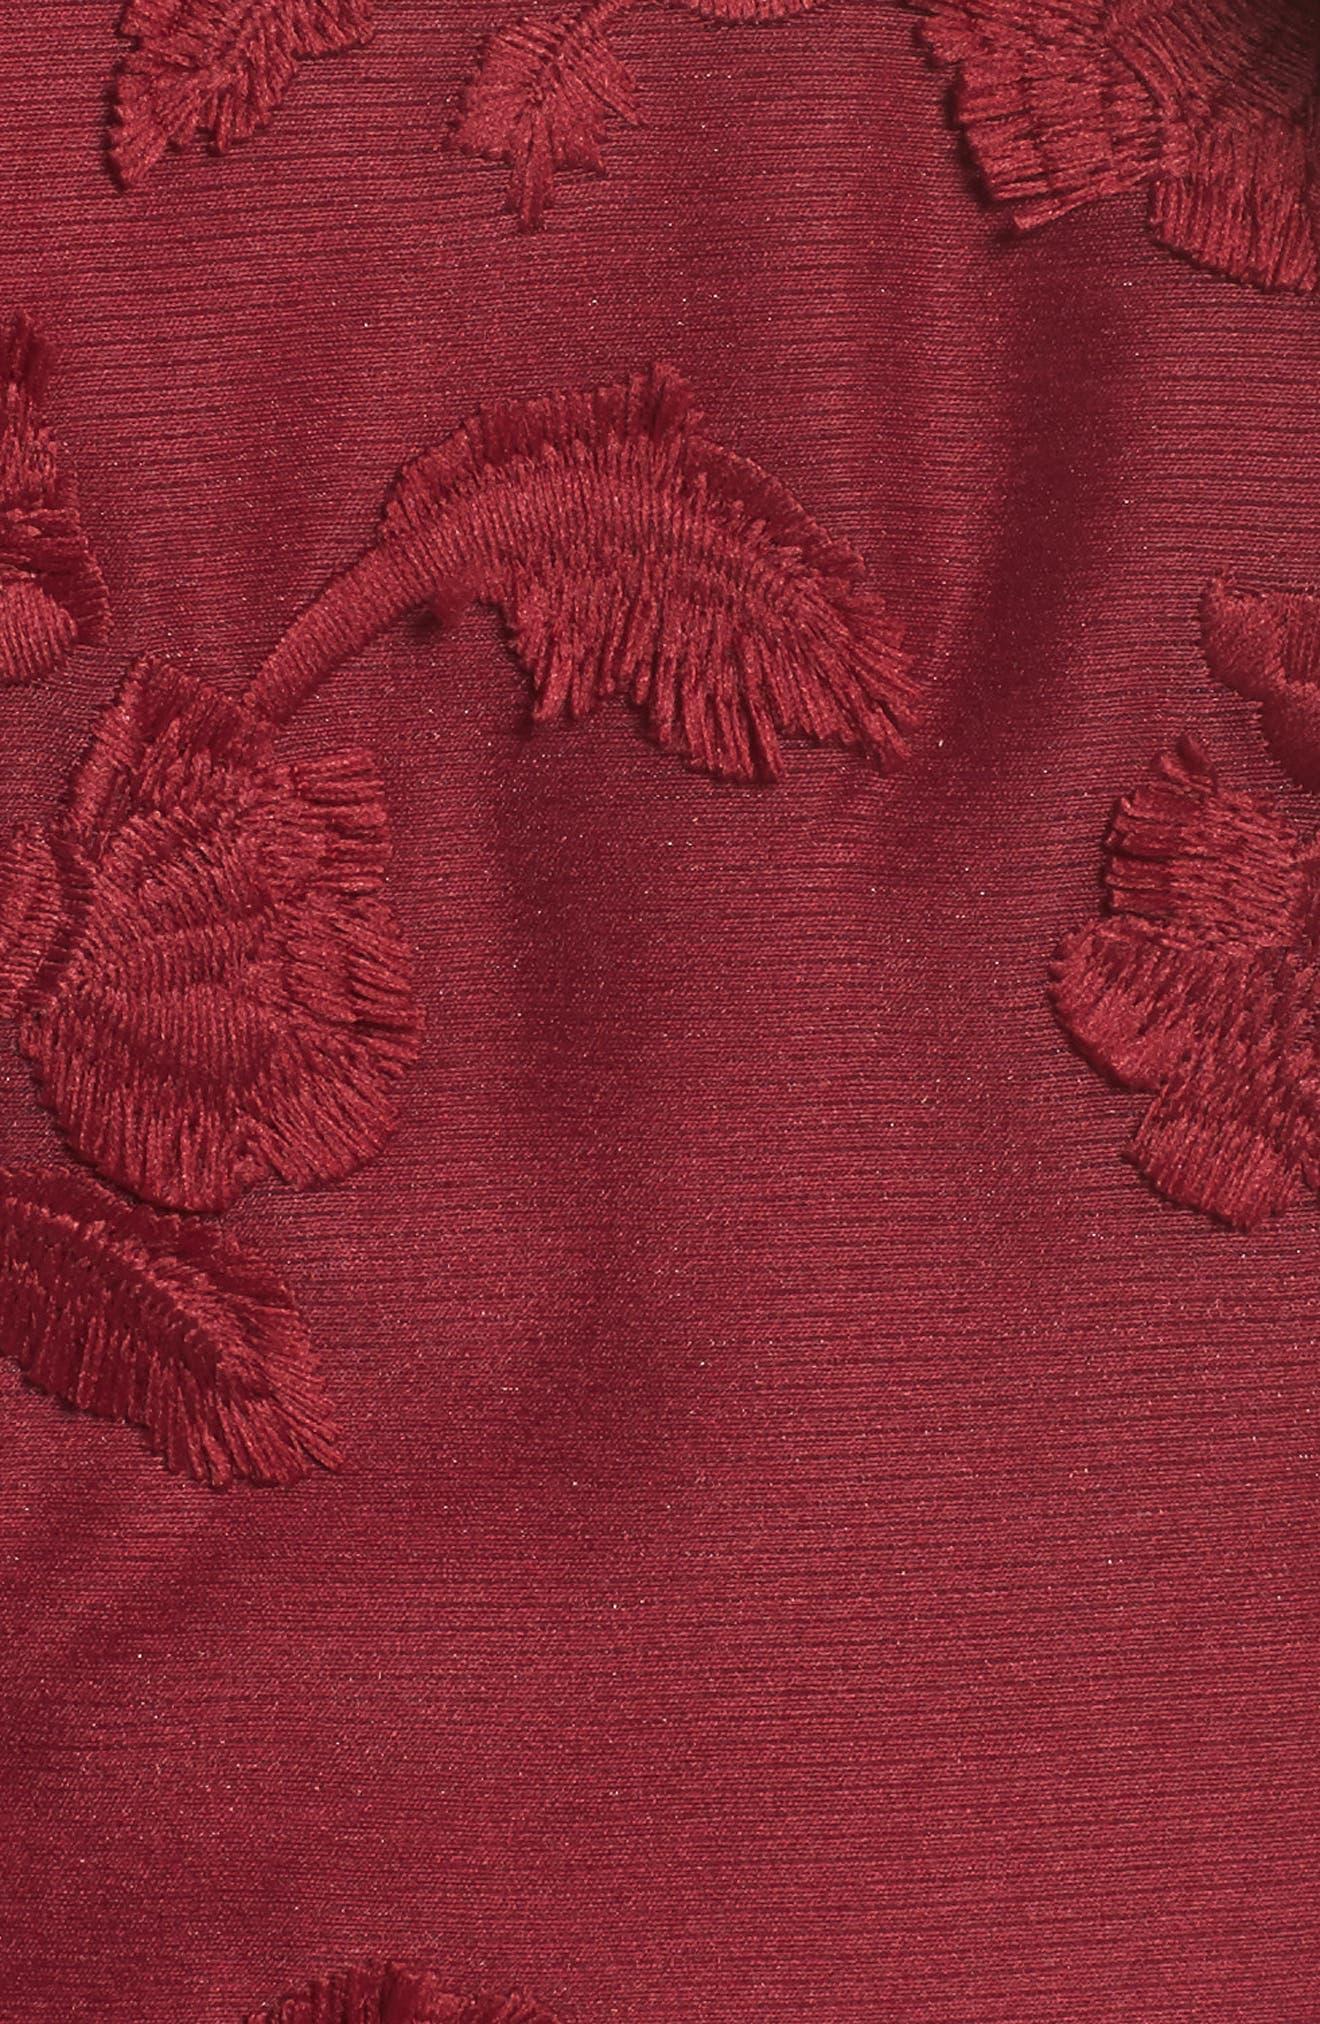 Shine Ruffle Lace Tea Length Dress,                             Alternate thumbnail 5, color,                             Raspberry